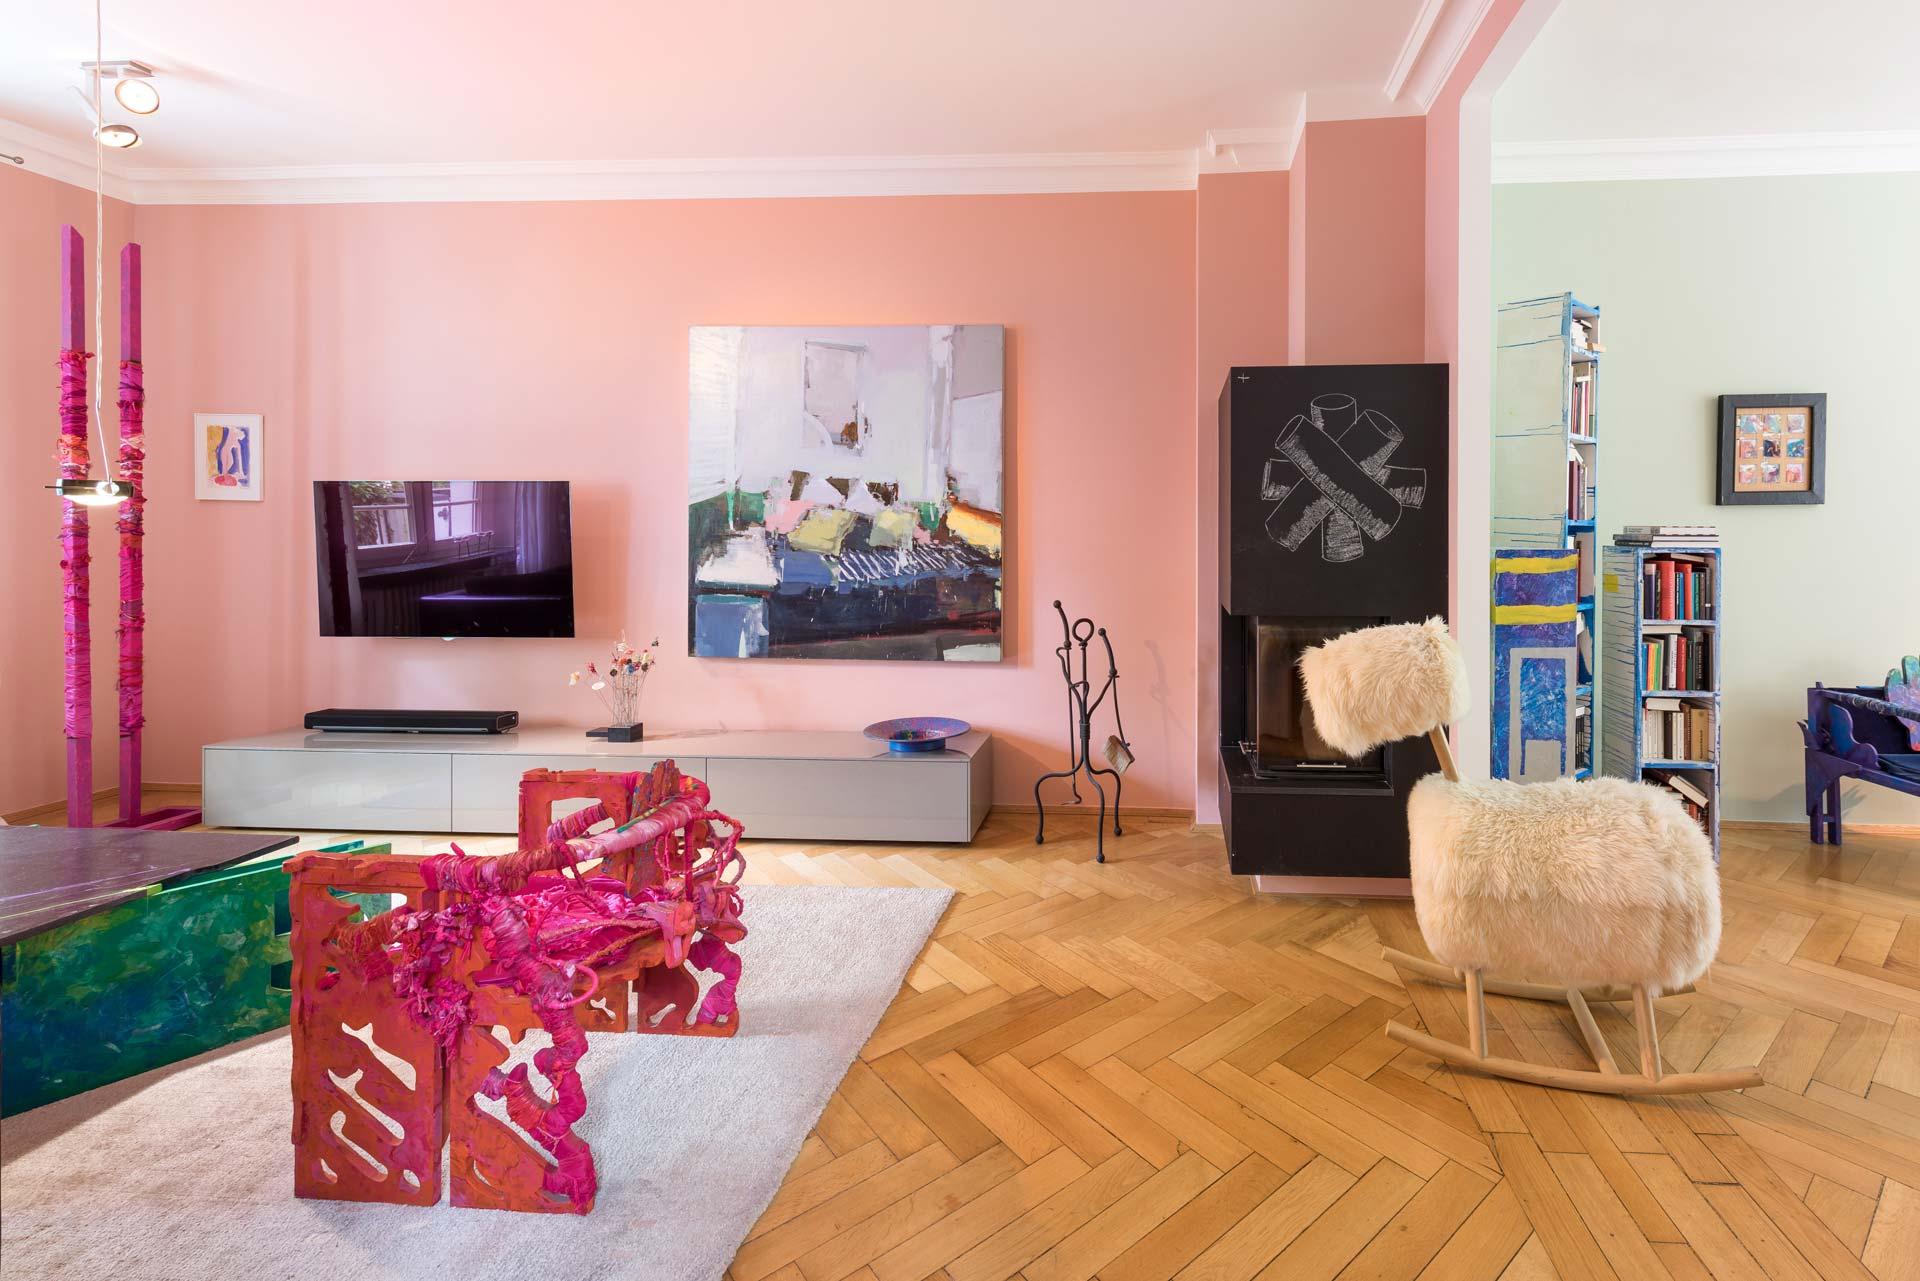 Das Privathaus Köln interieurfotografie köln archiv martin gaissert privathaus köln